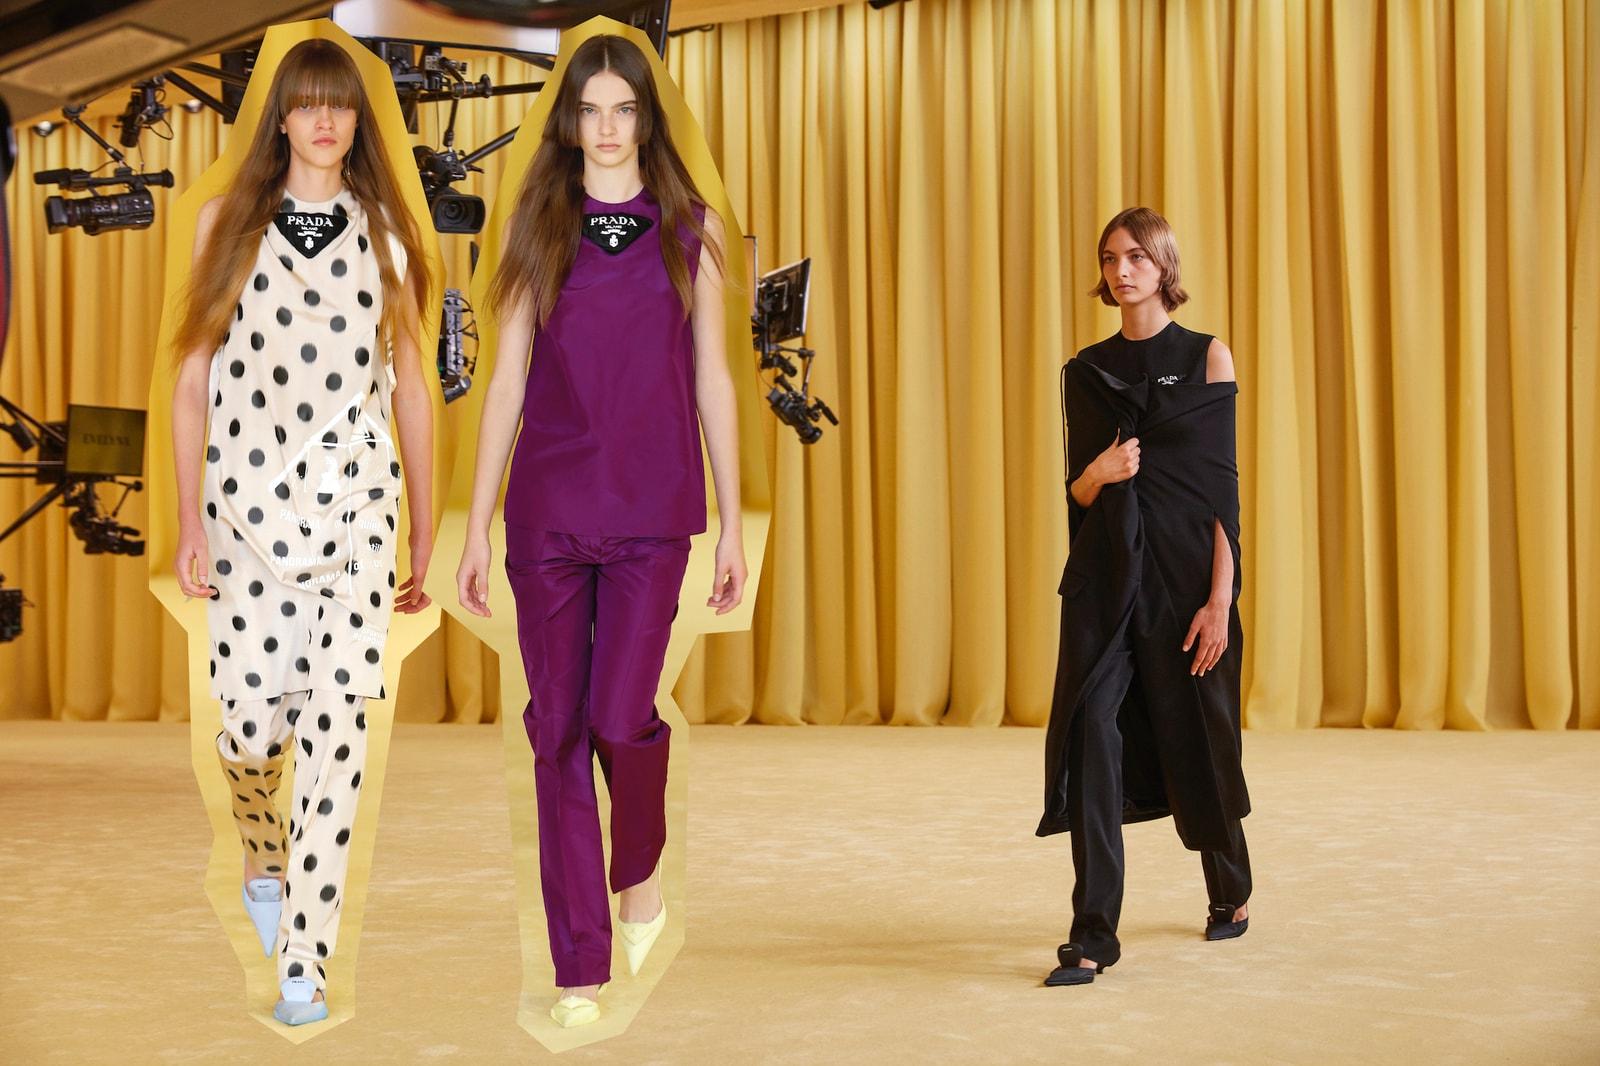 Raf Simons Miuccia Prada Debut Collection SS21 Show Op-Ed Review Set